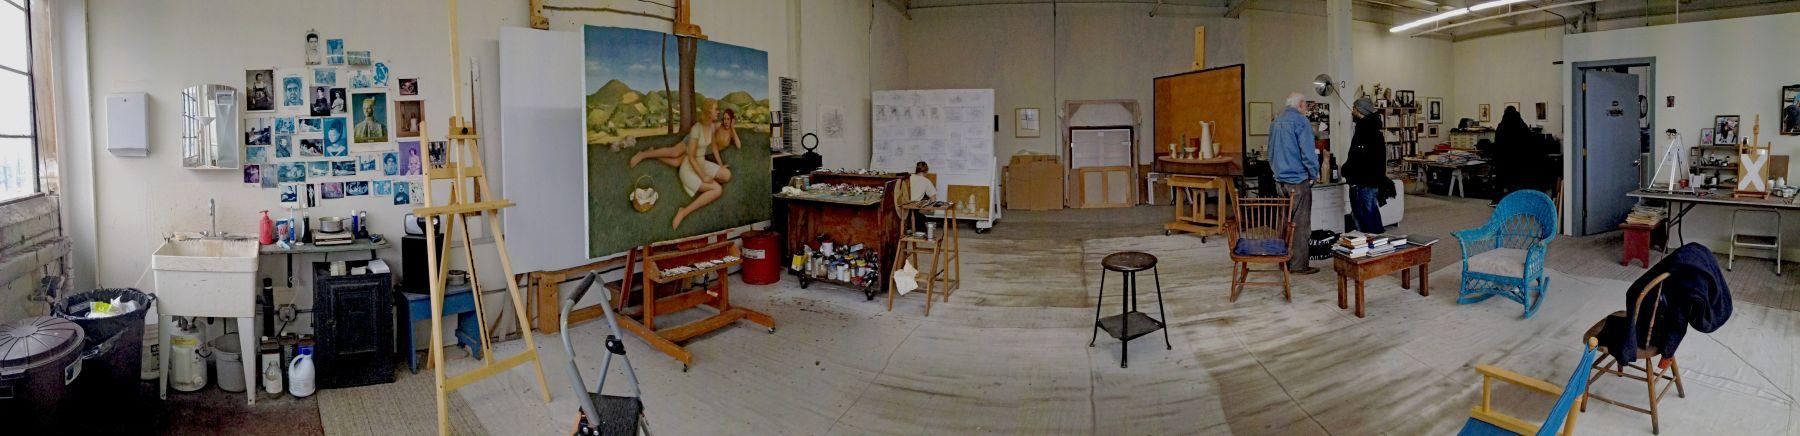 Image of Bill's Studio